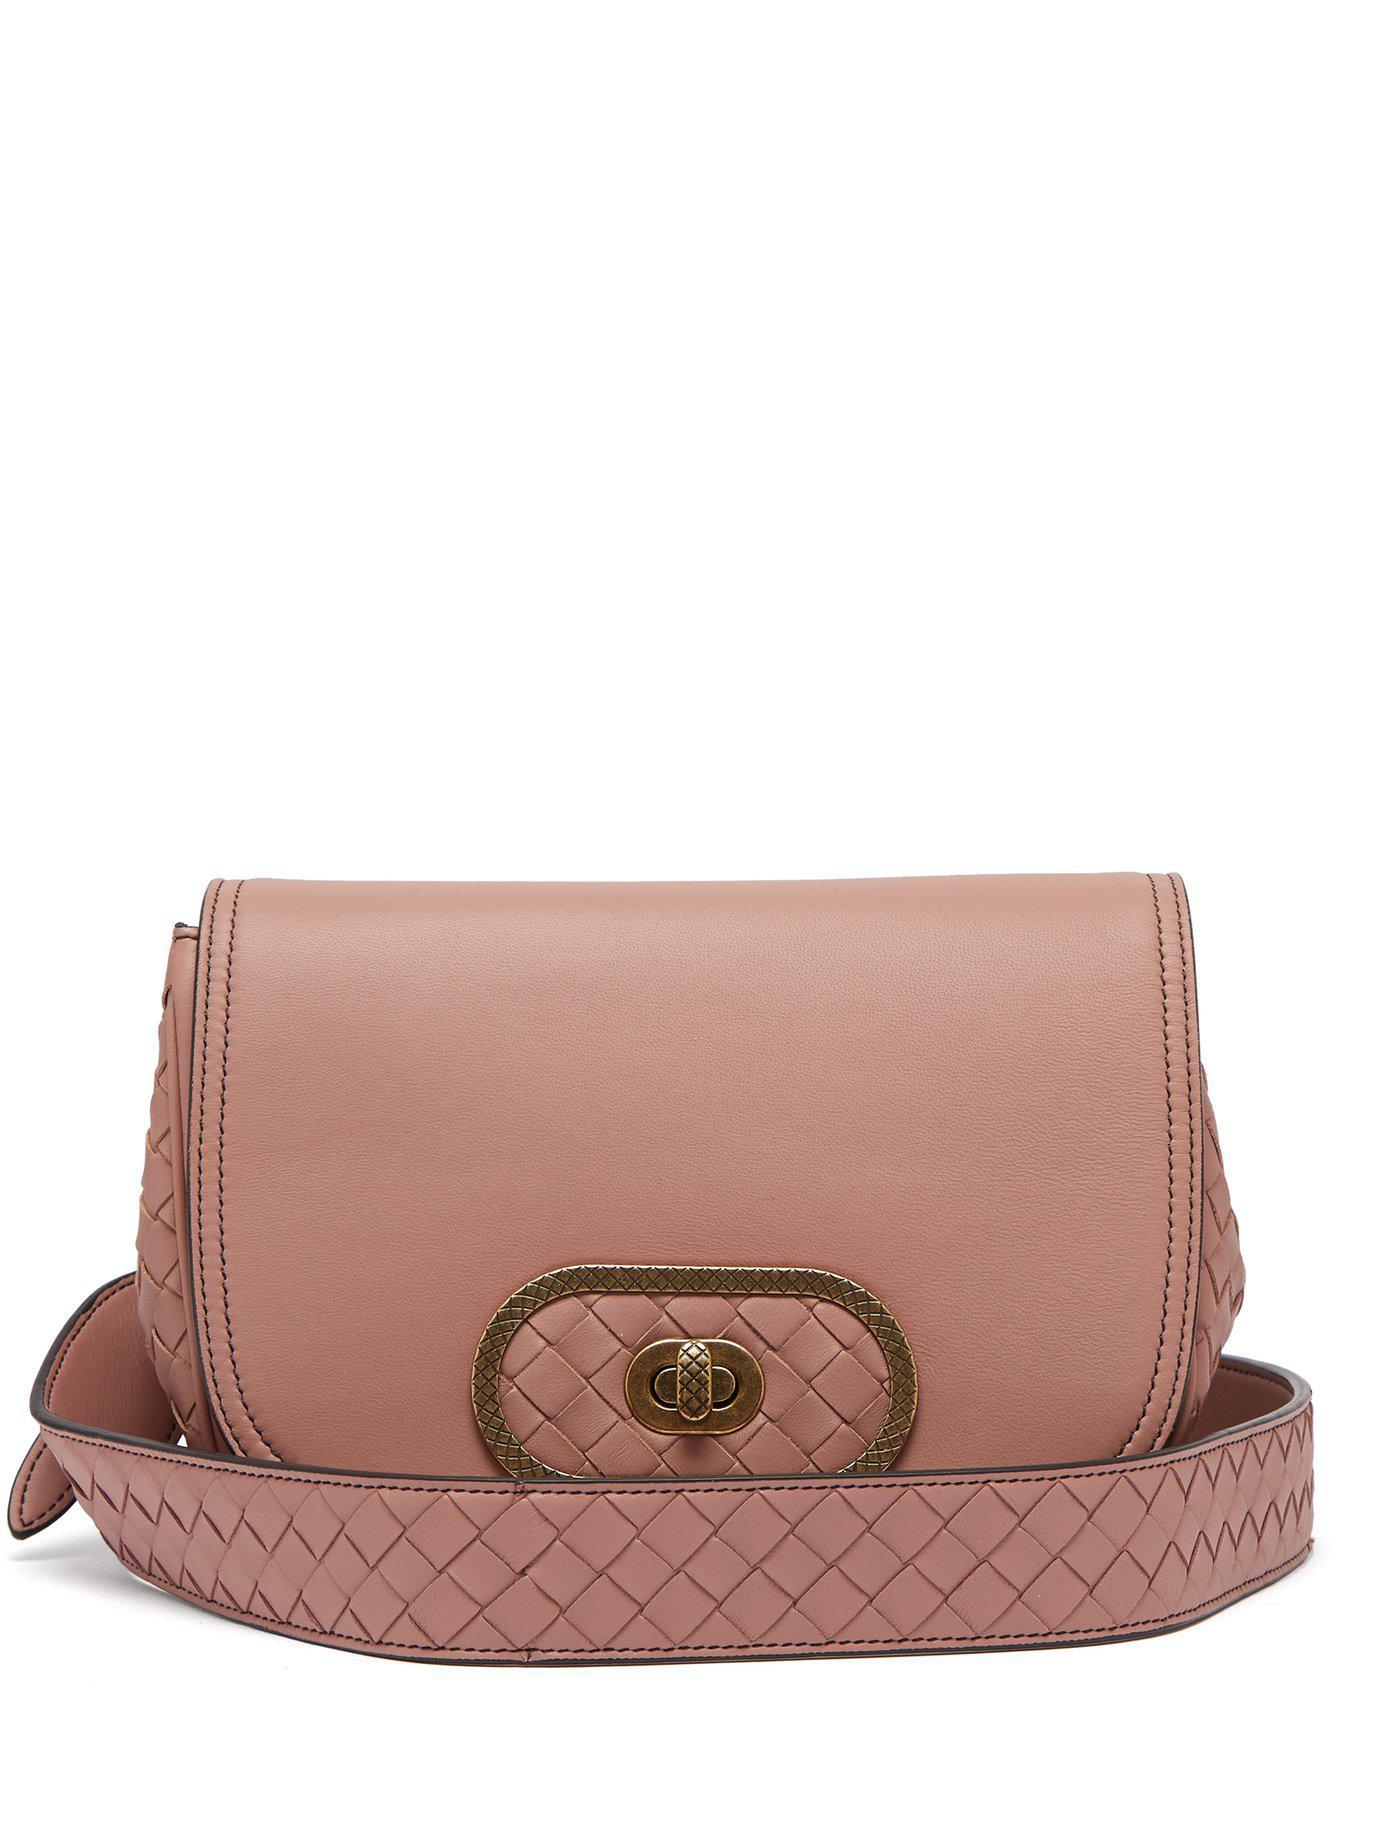 cd5718164d8b Lyst - Bottega Veneta Bv Luna Leather Cross Body Bag in Pink